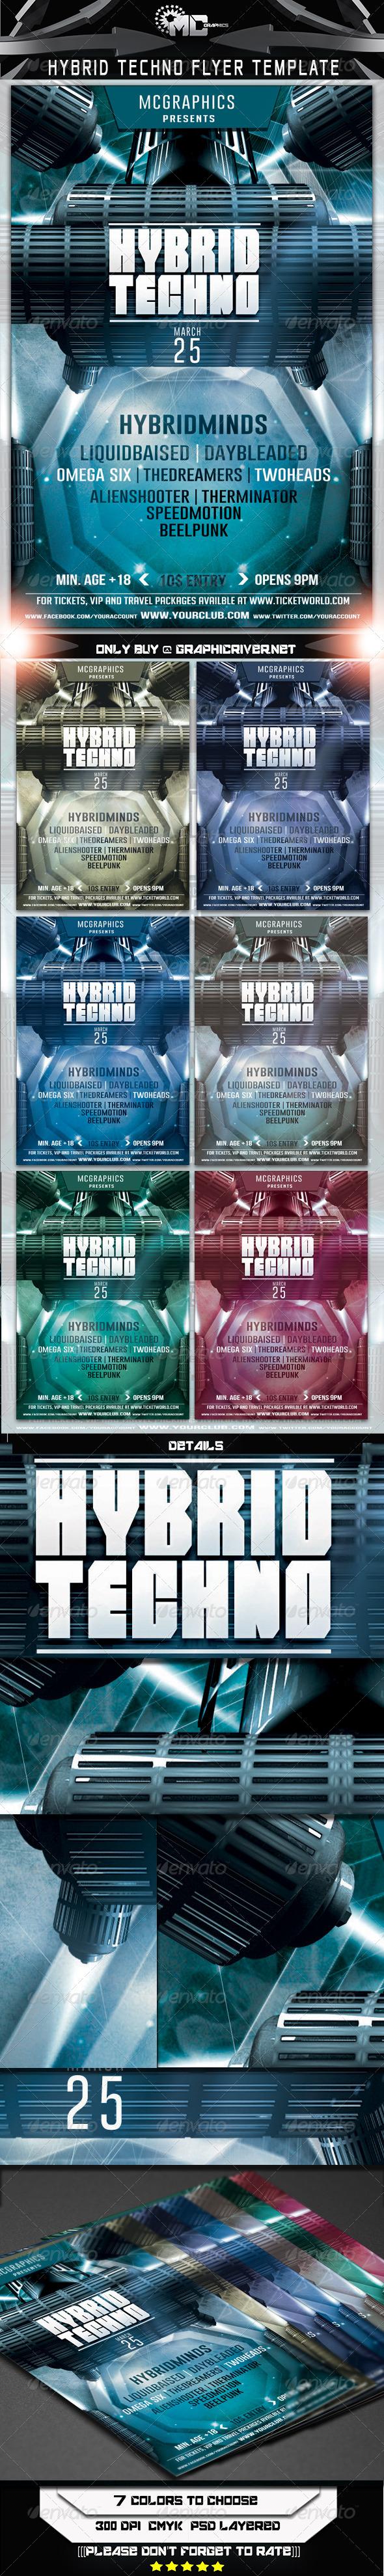 GraphicRiver Hybrid Techno Flyer Template 6791109